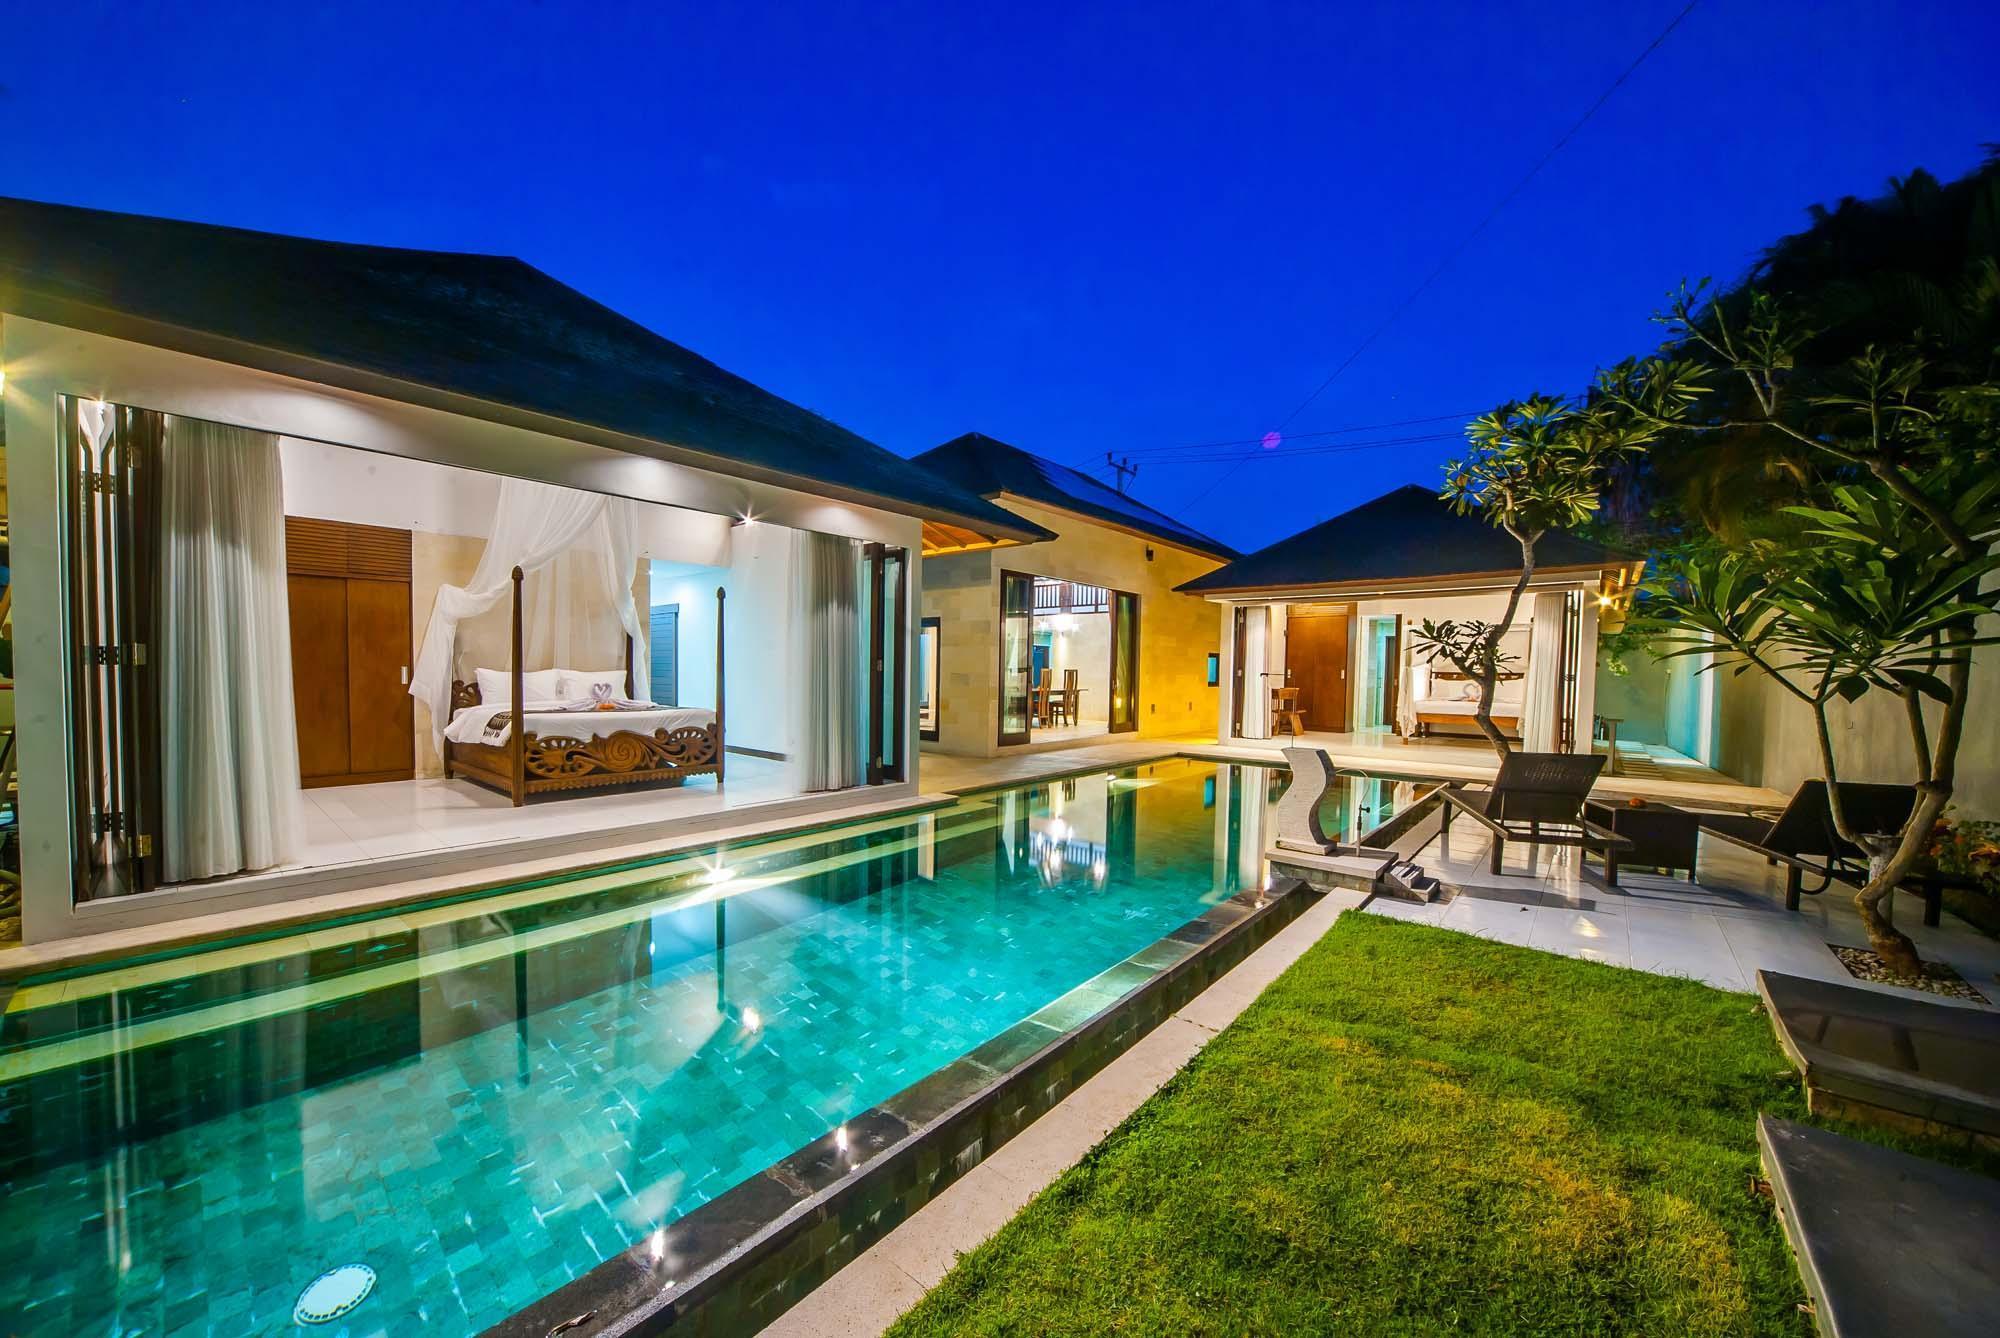 Re Open PROMO 2BR Kaya Villa A Few Min To Beach